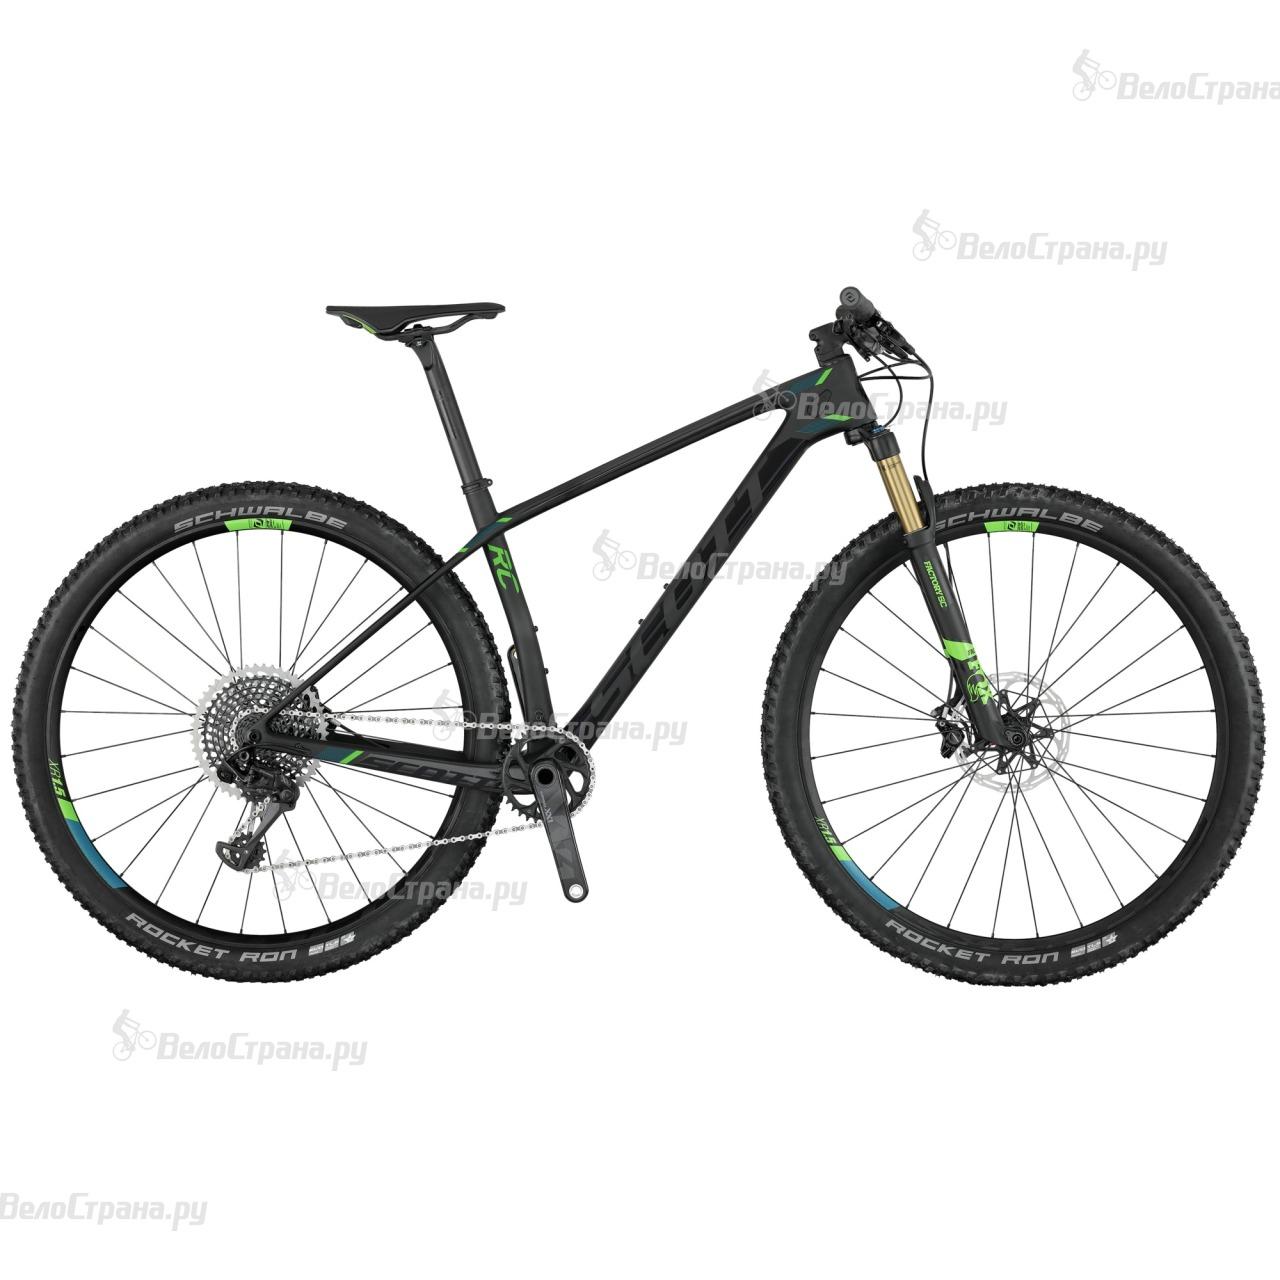 Велосипед Scott Scale RC 900 Ultimate (2017) scott scale 700 rc 2016